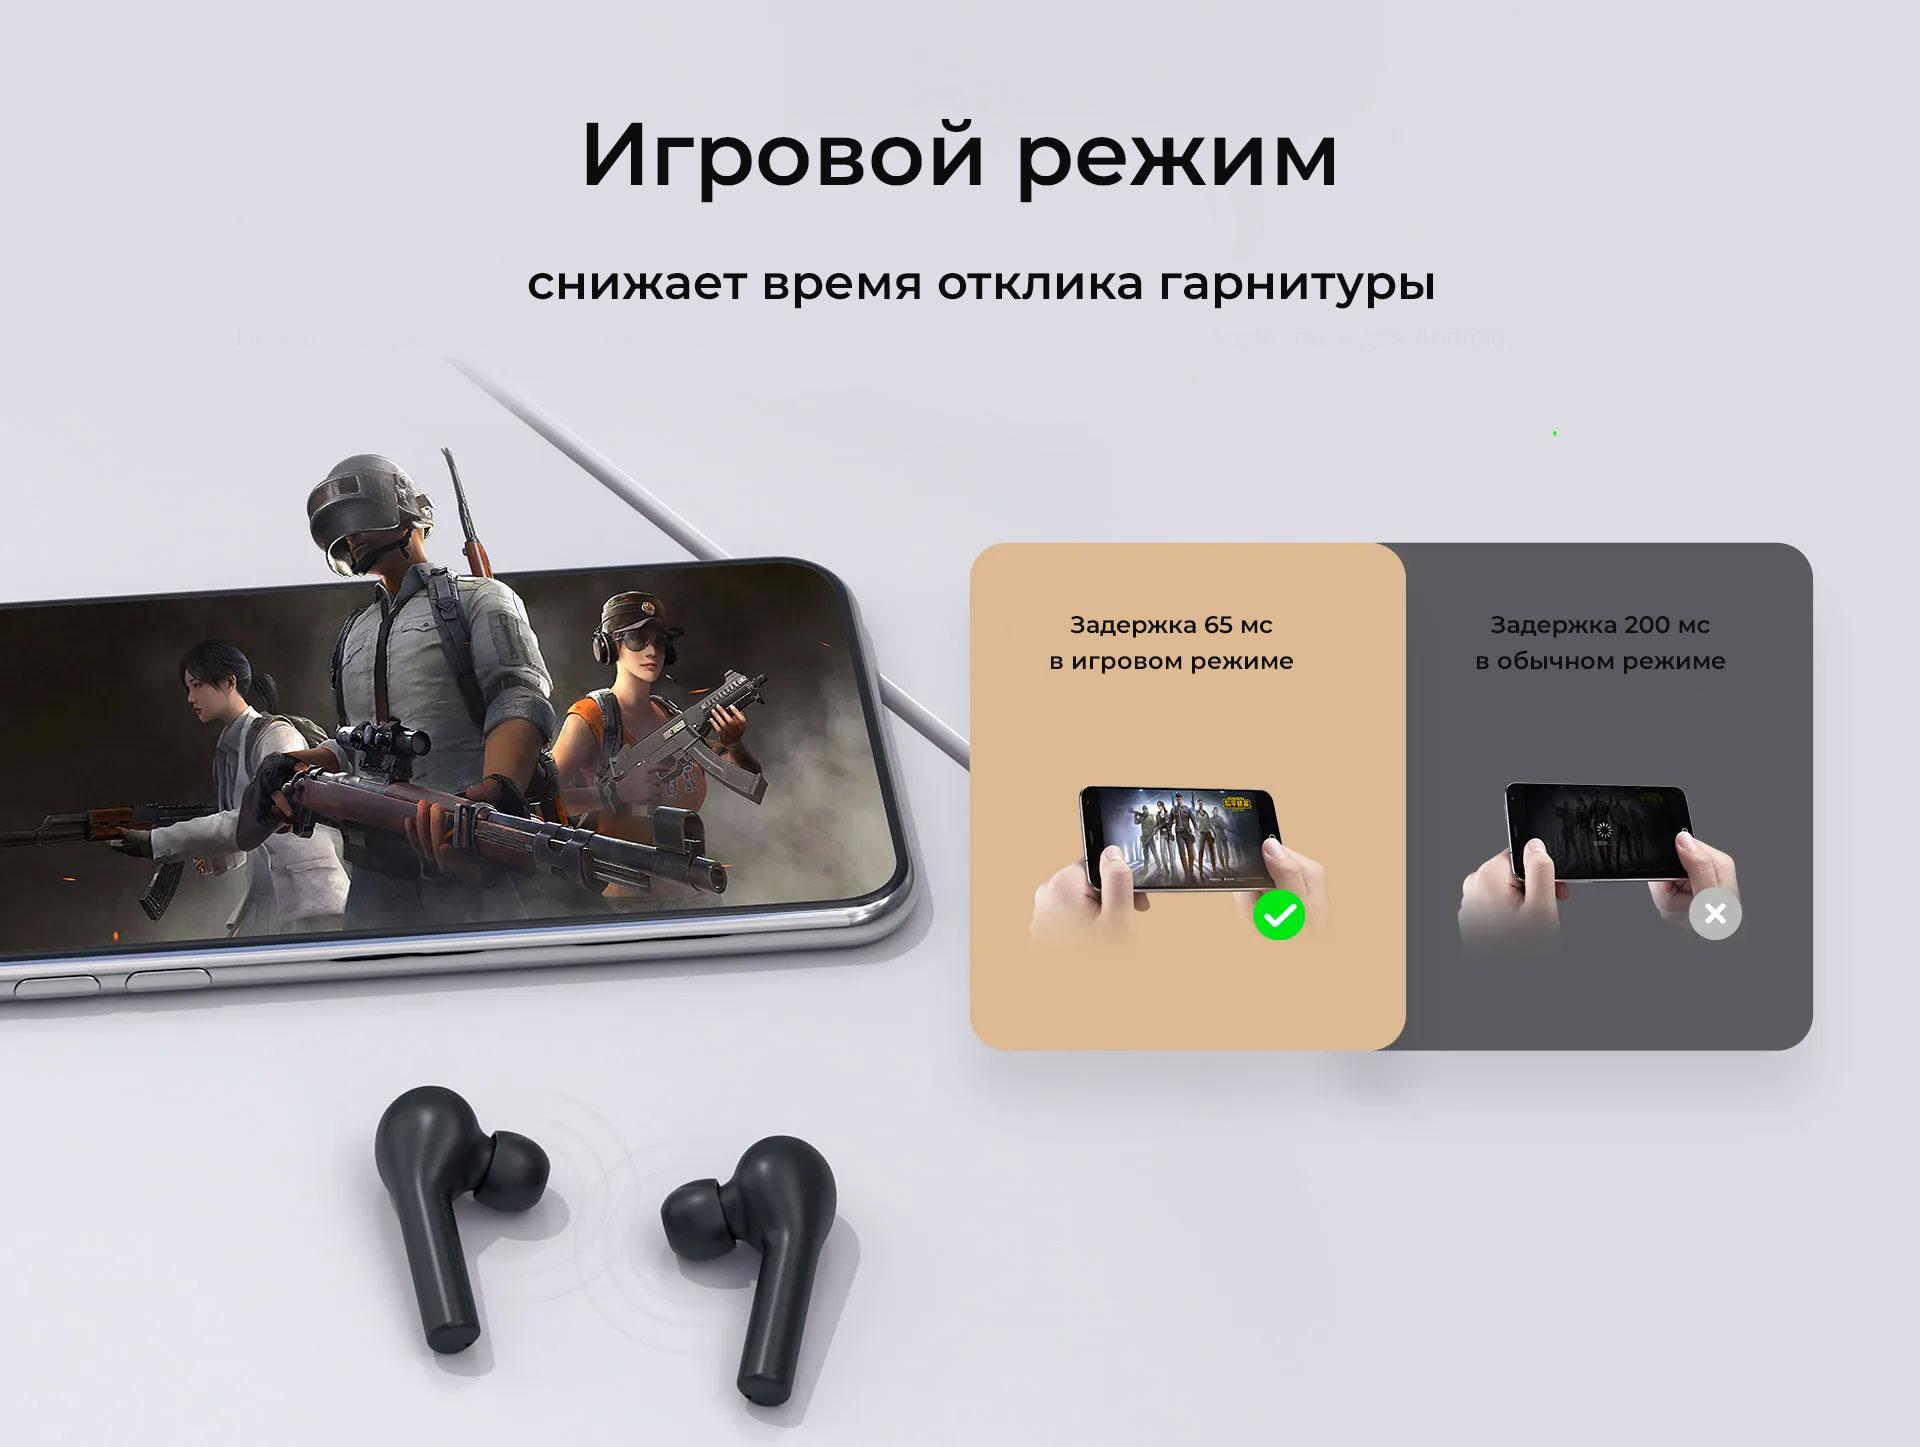 Opisanie Besprovodnye Naushniki Xiaomi Qcy T5s 1